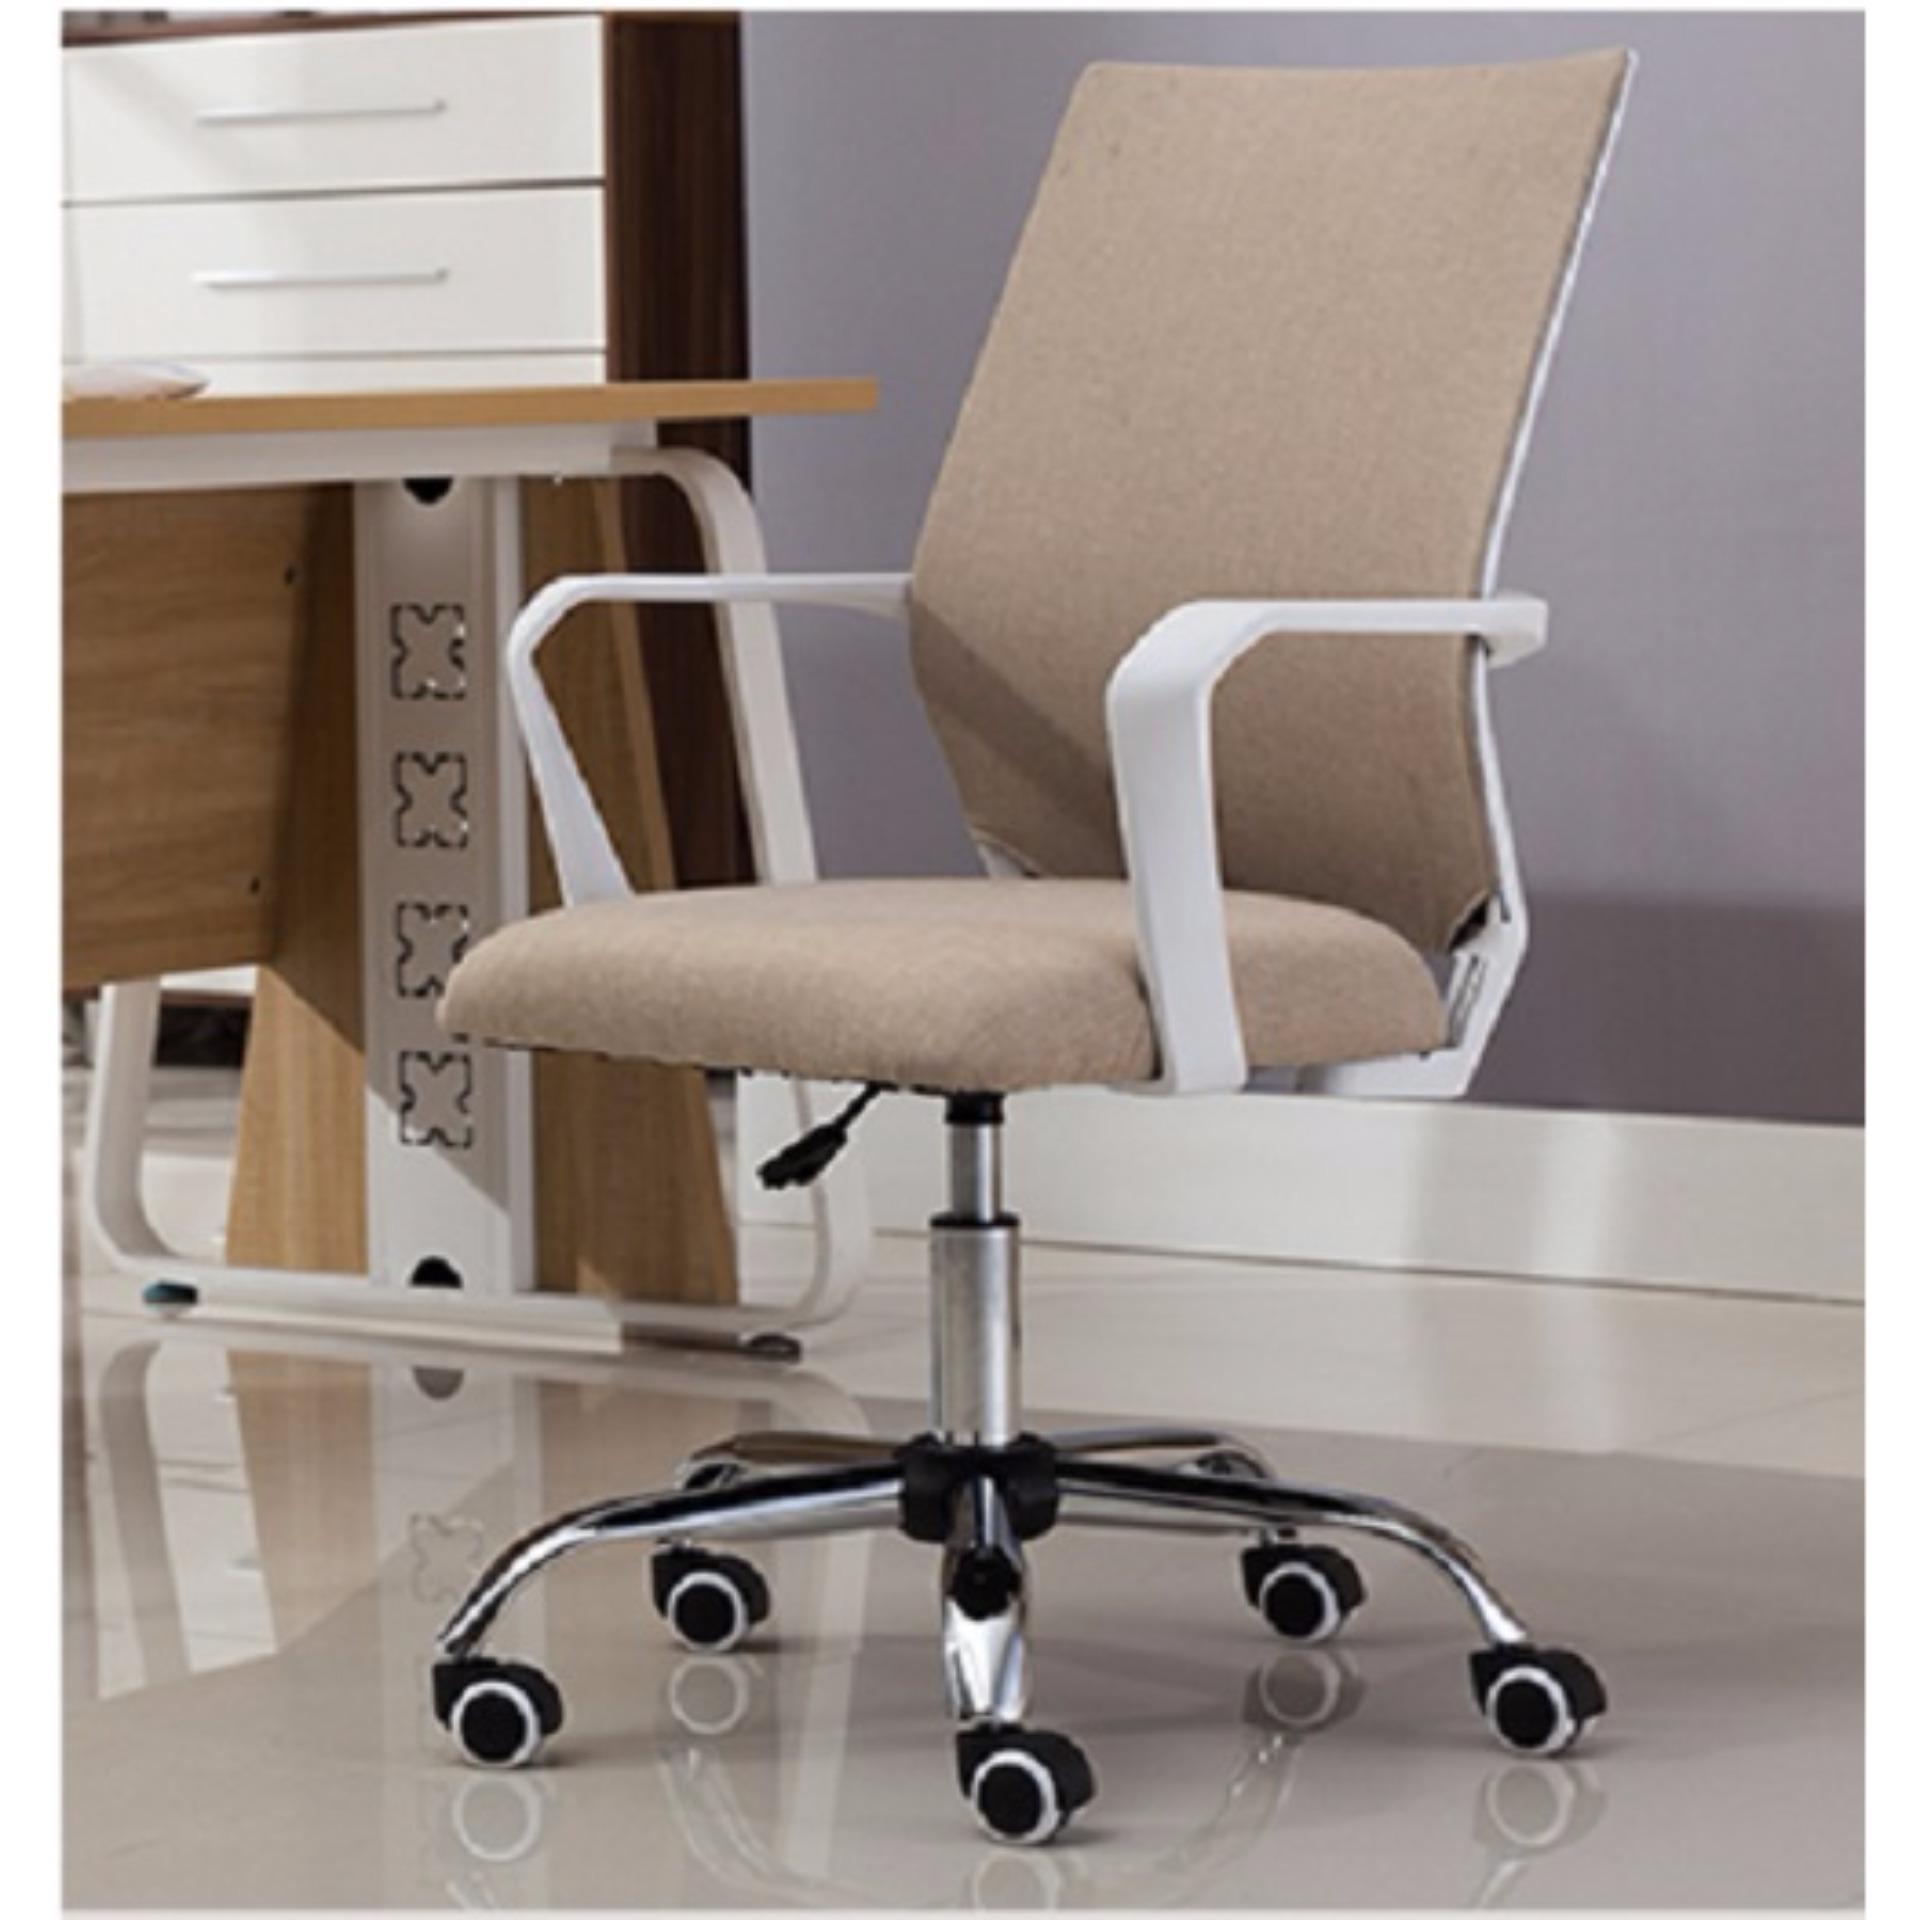 ergonomic chair singapore push back recliner home office